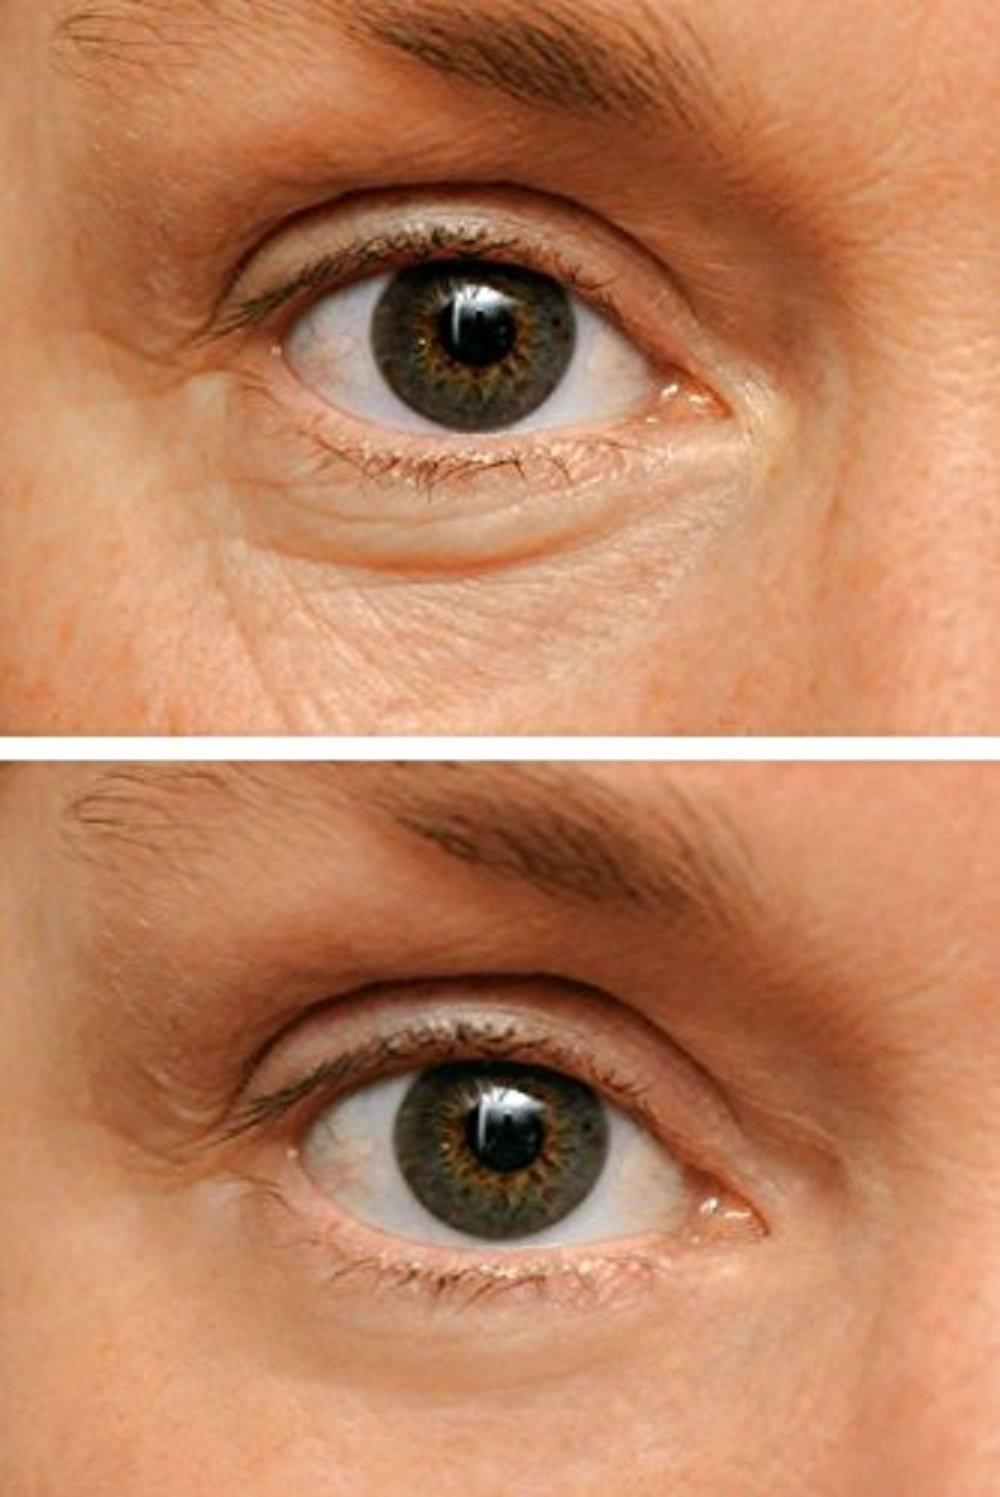 WUNDER2 WUNDERLIFT 60 Seconds Wrinkle Reducer - Eye Serum to Reduce Lines and Dark Circles by Wunder2 (Image #4)